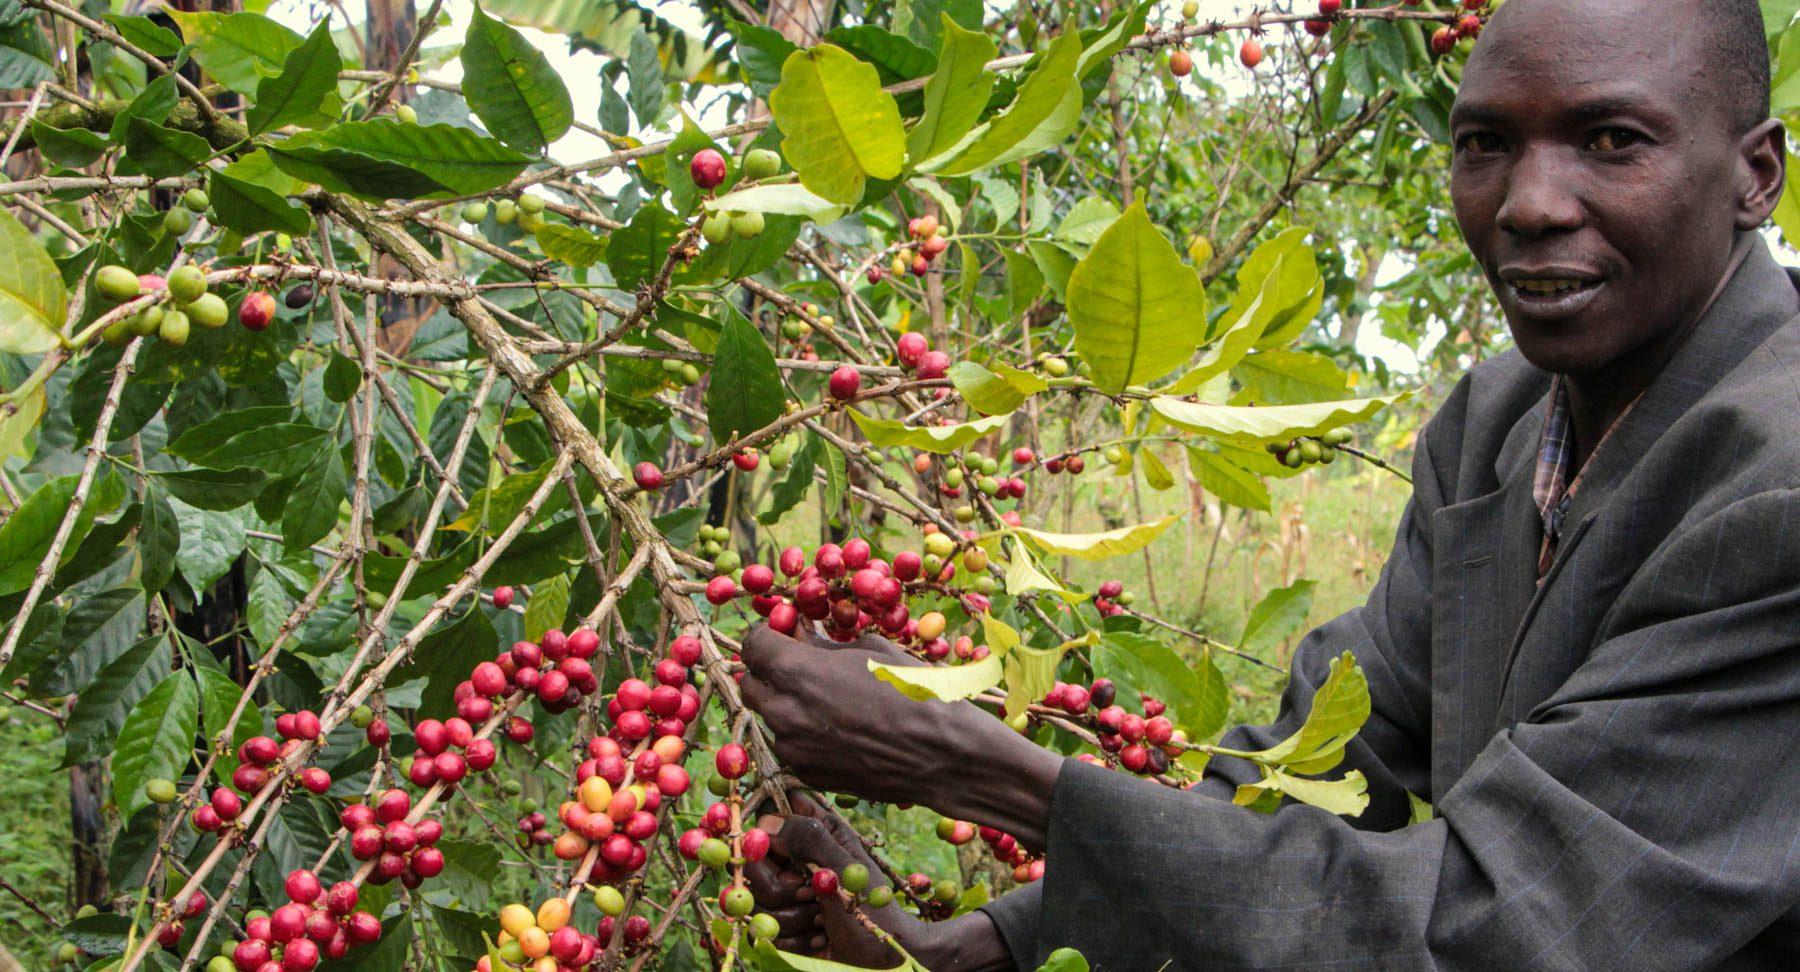 Kaffee-Ernte 2013 in Uganda am Mount Elgon auf 2000m Höhe